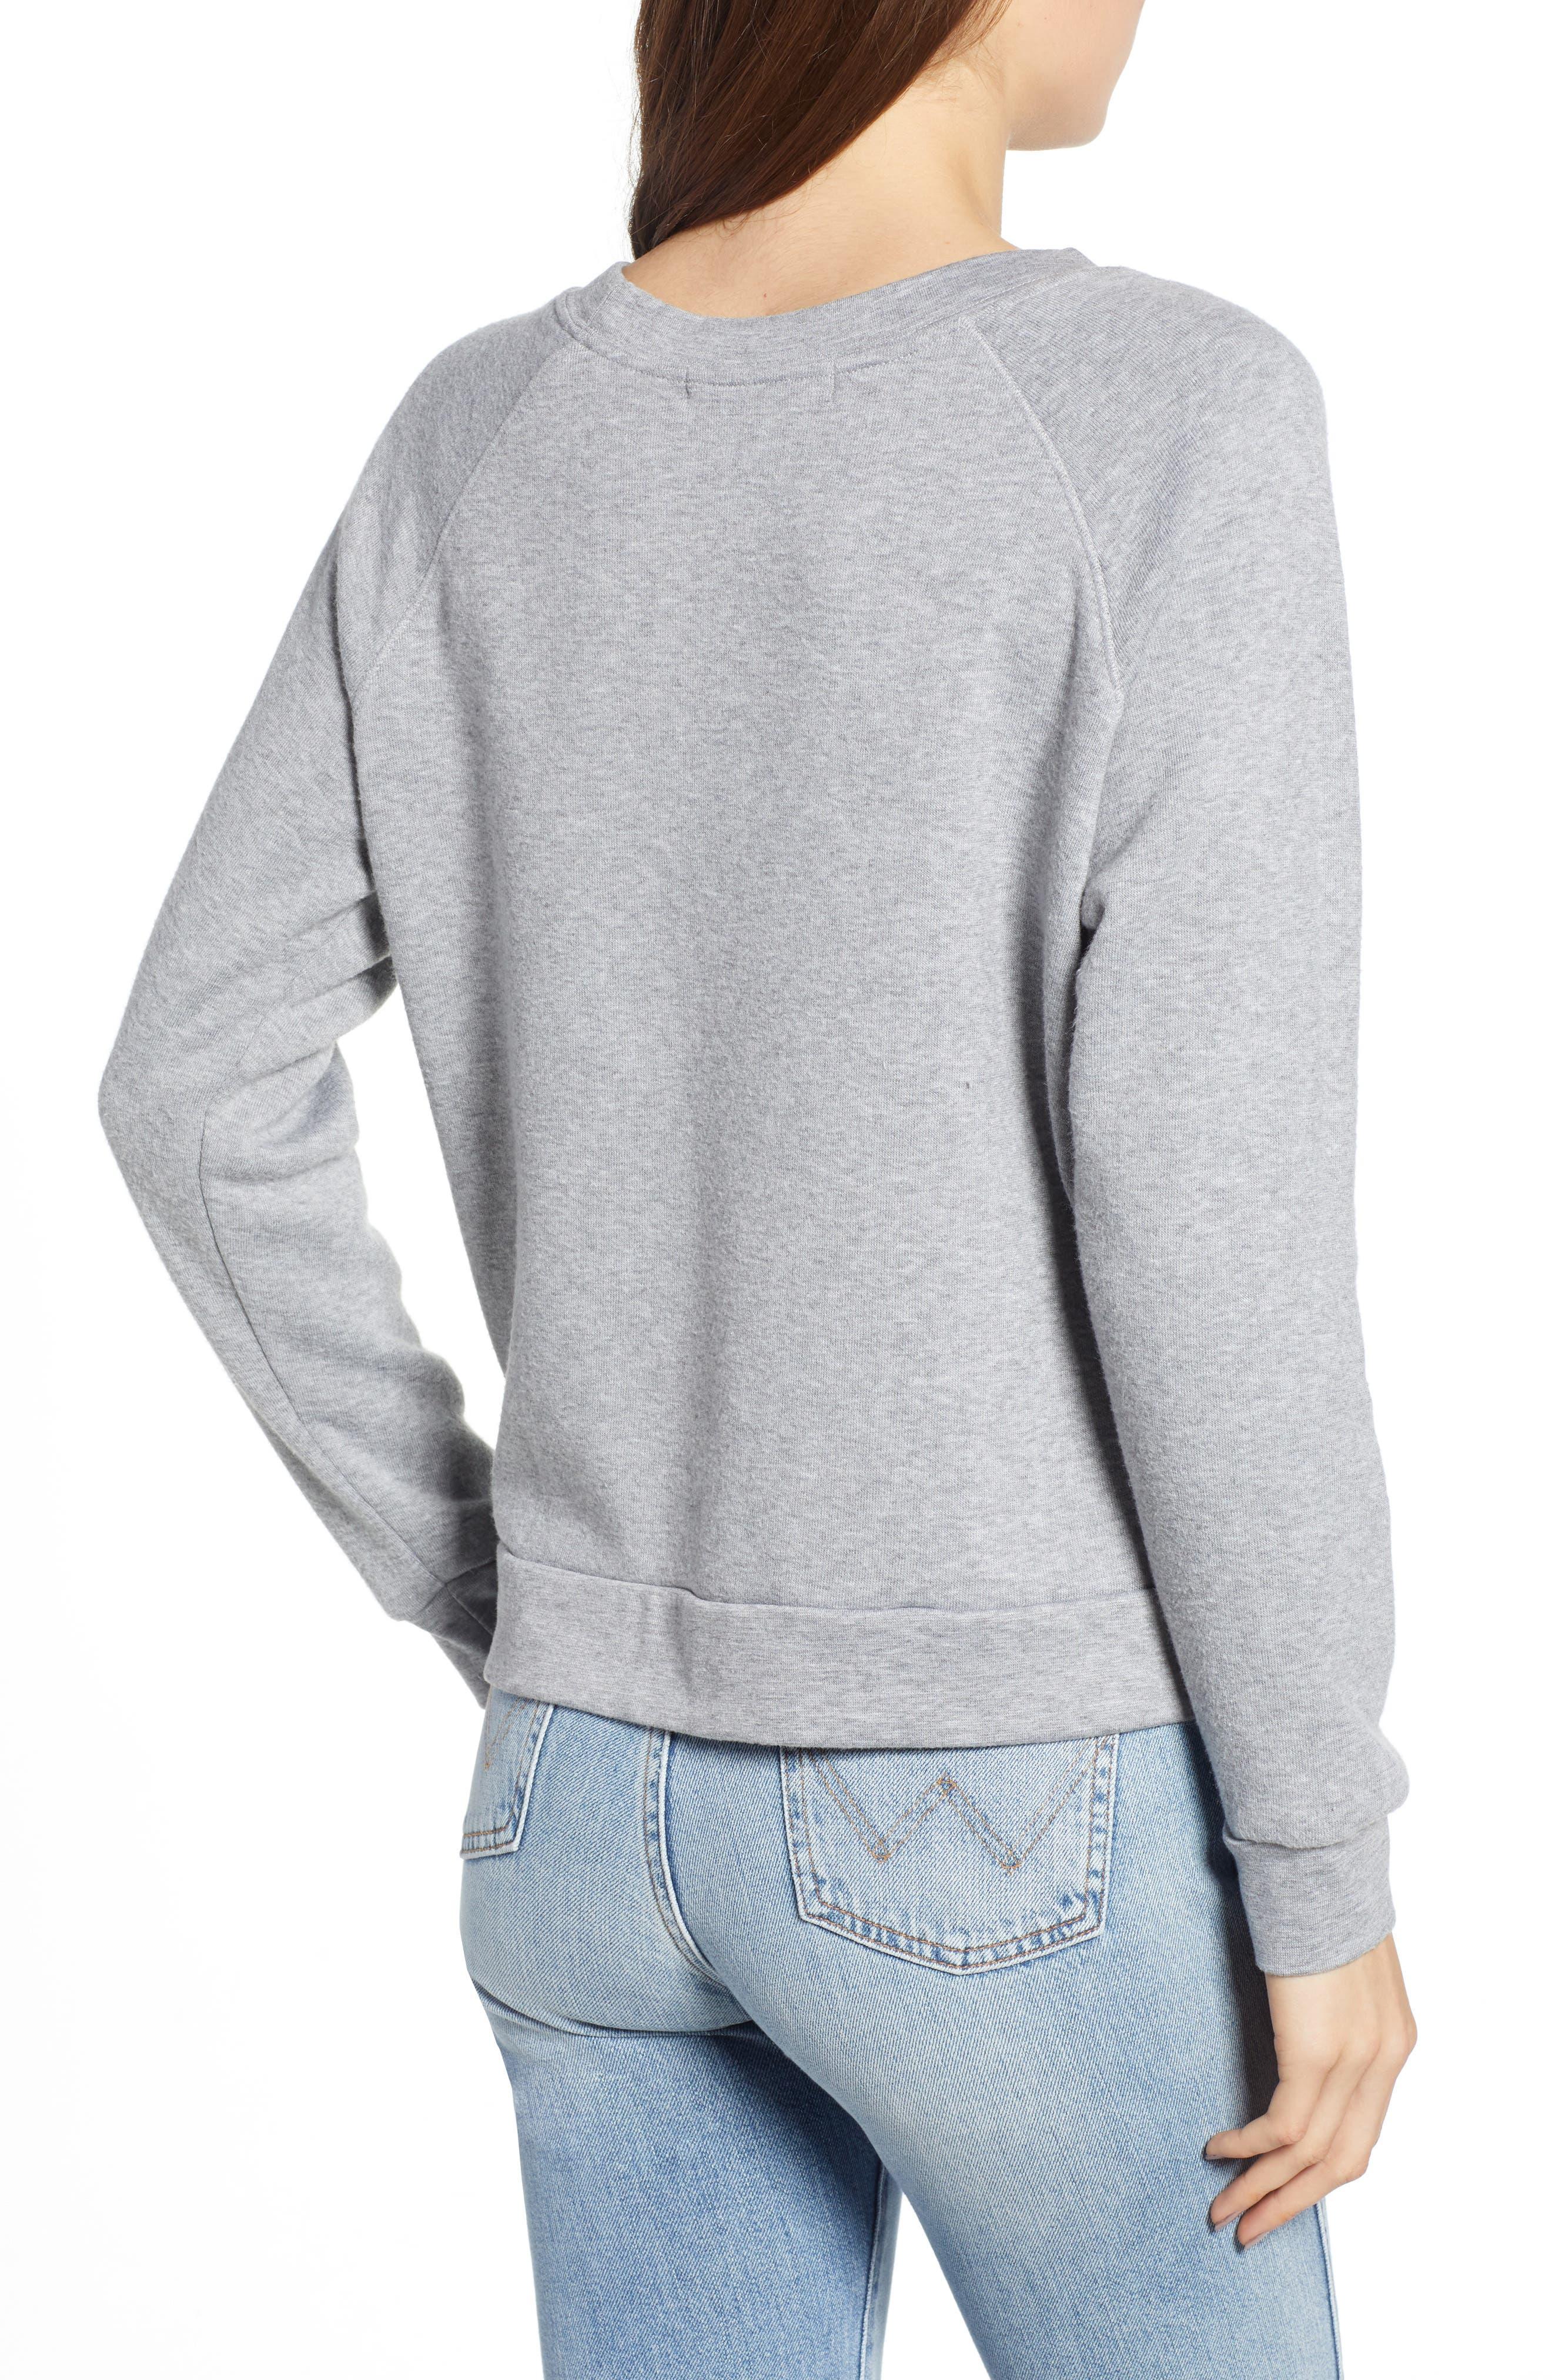 Reversible Graphic Sweatshirt,                             Alternate thumbnail 3, color,                             HEATHER GREY